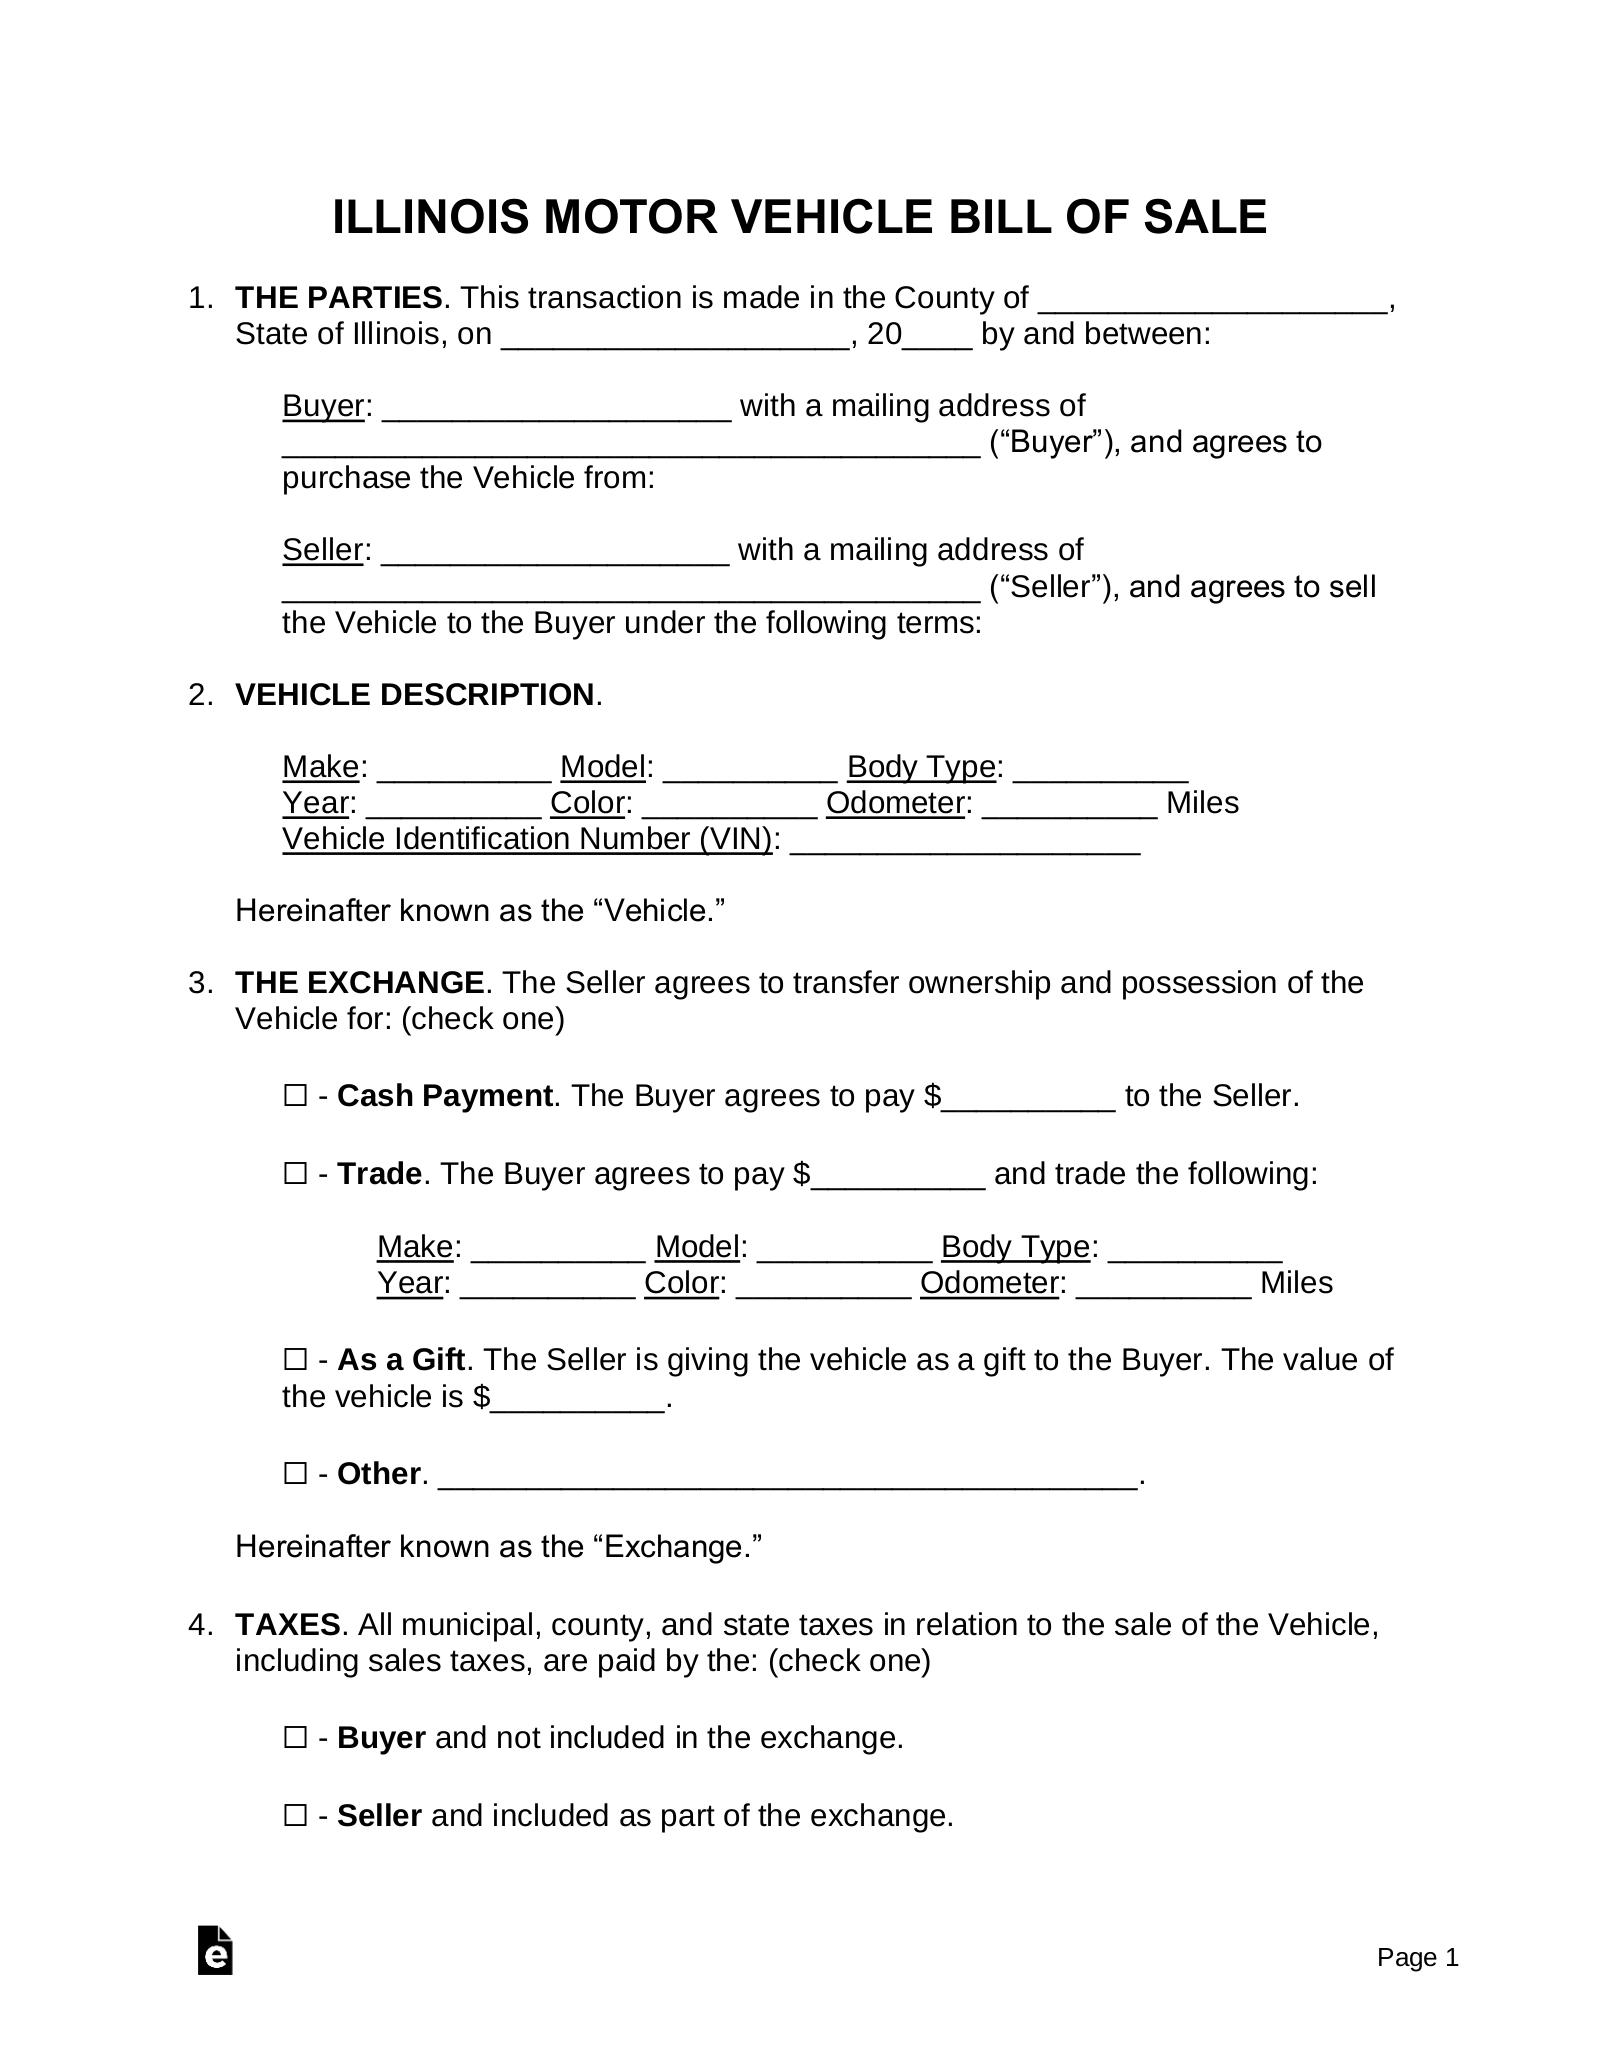 Free Illinois Motor Vehicle Bill of Sale Form   Word   PDF – eForms